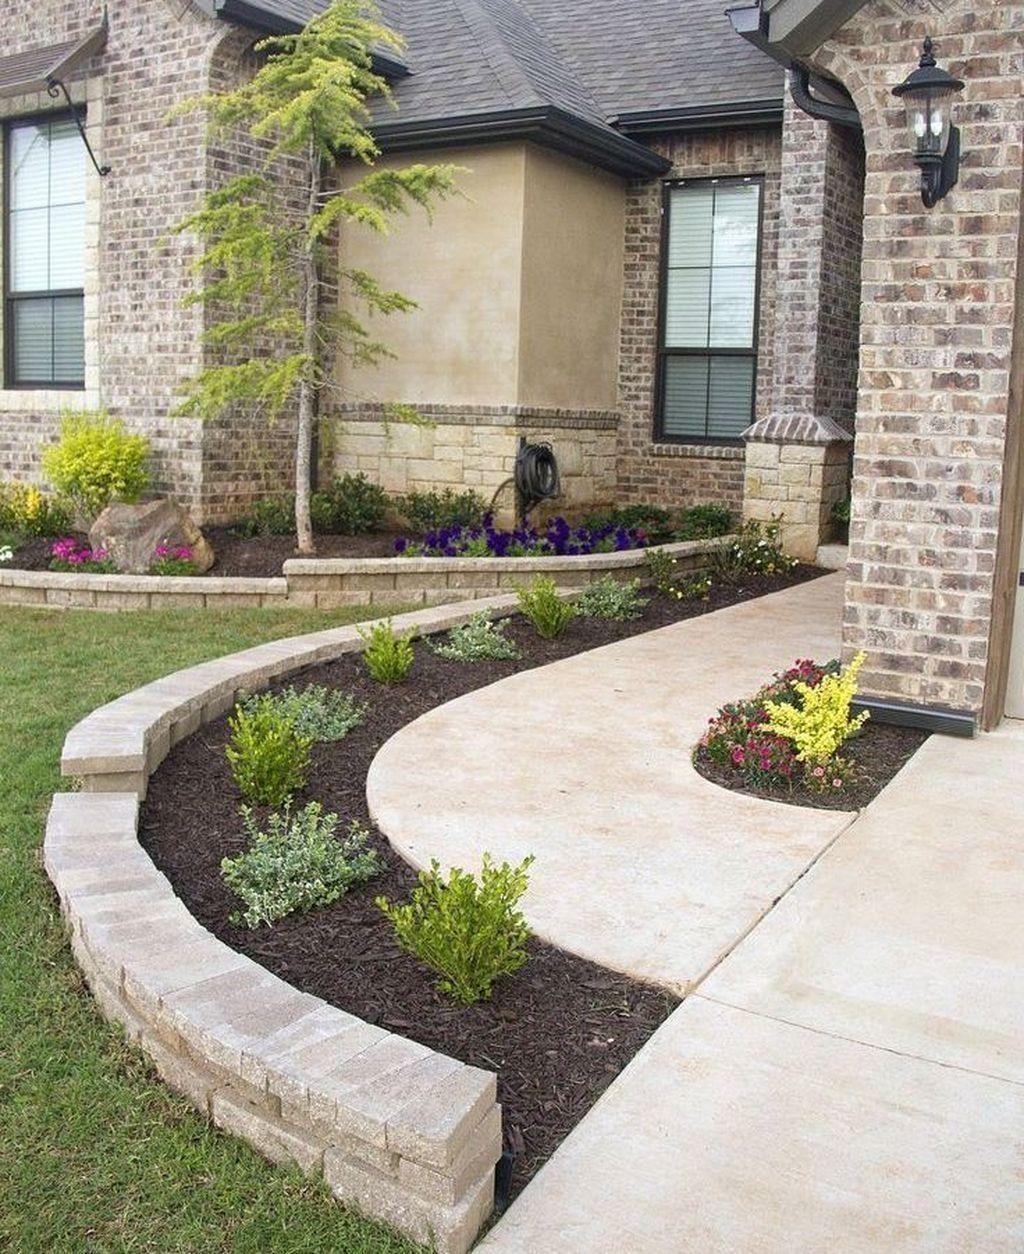 Creative Cheap Garden Ideas: 36 Creative Front Yard Landscaping Ideas On A Budget